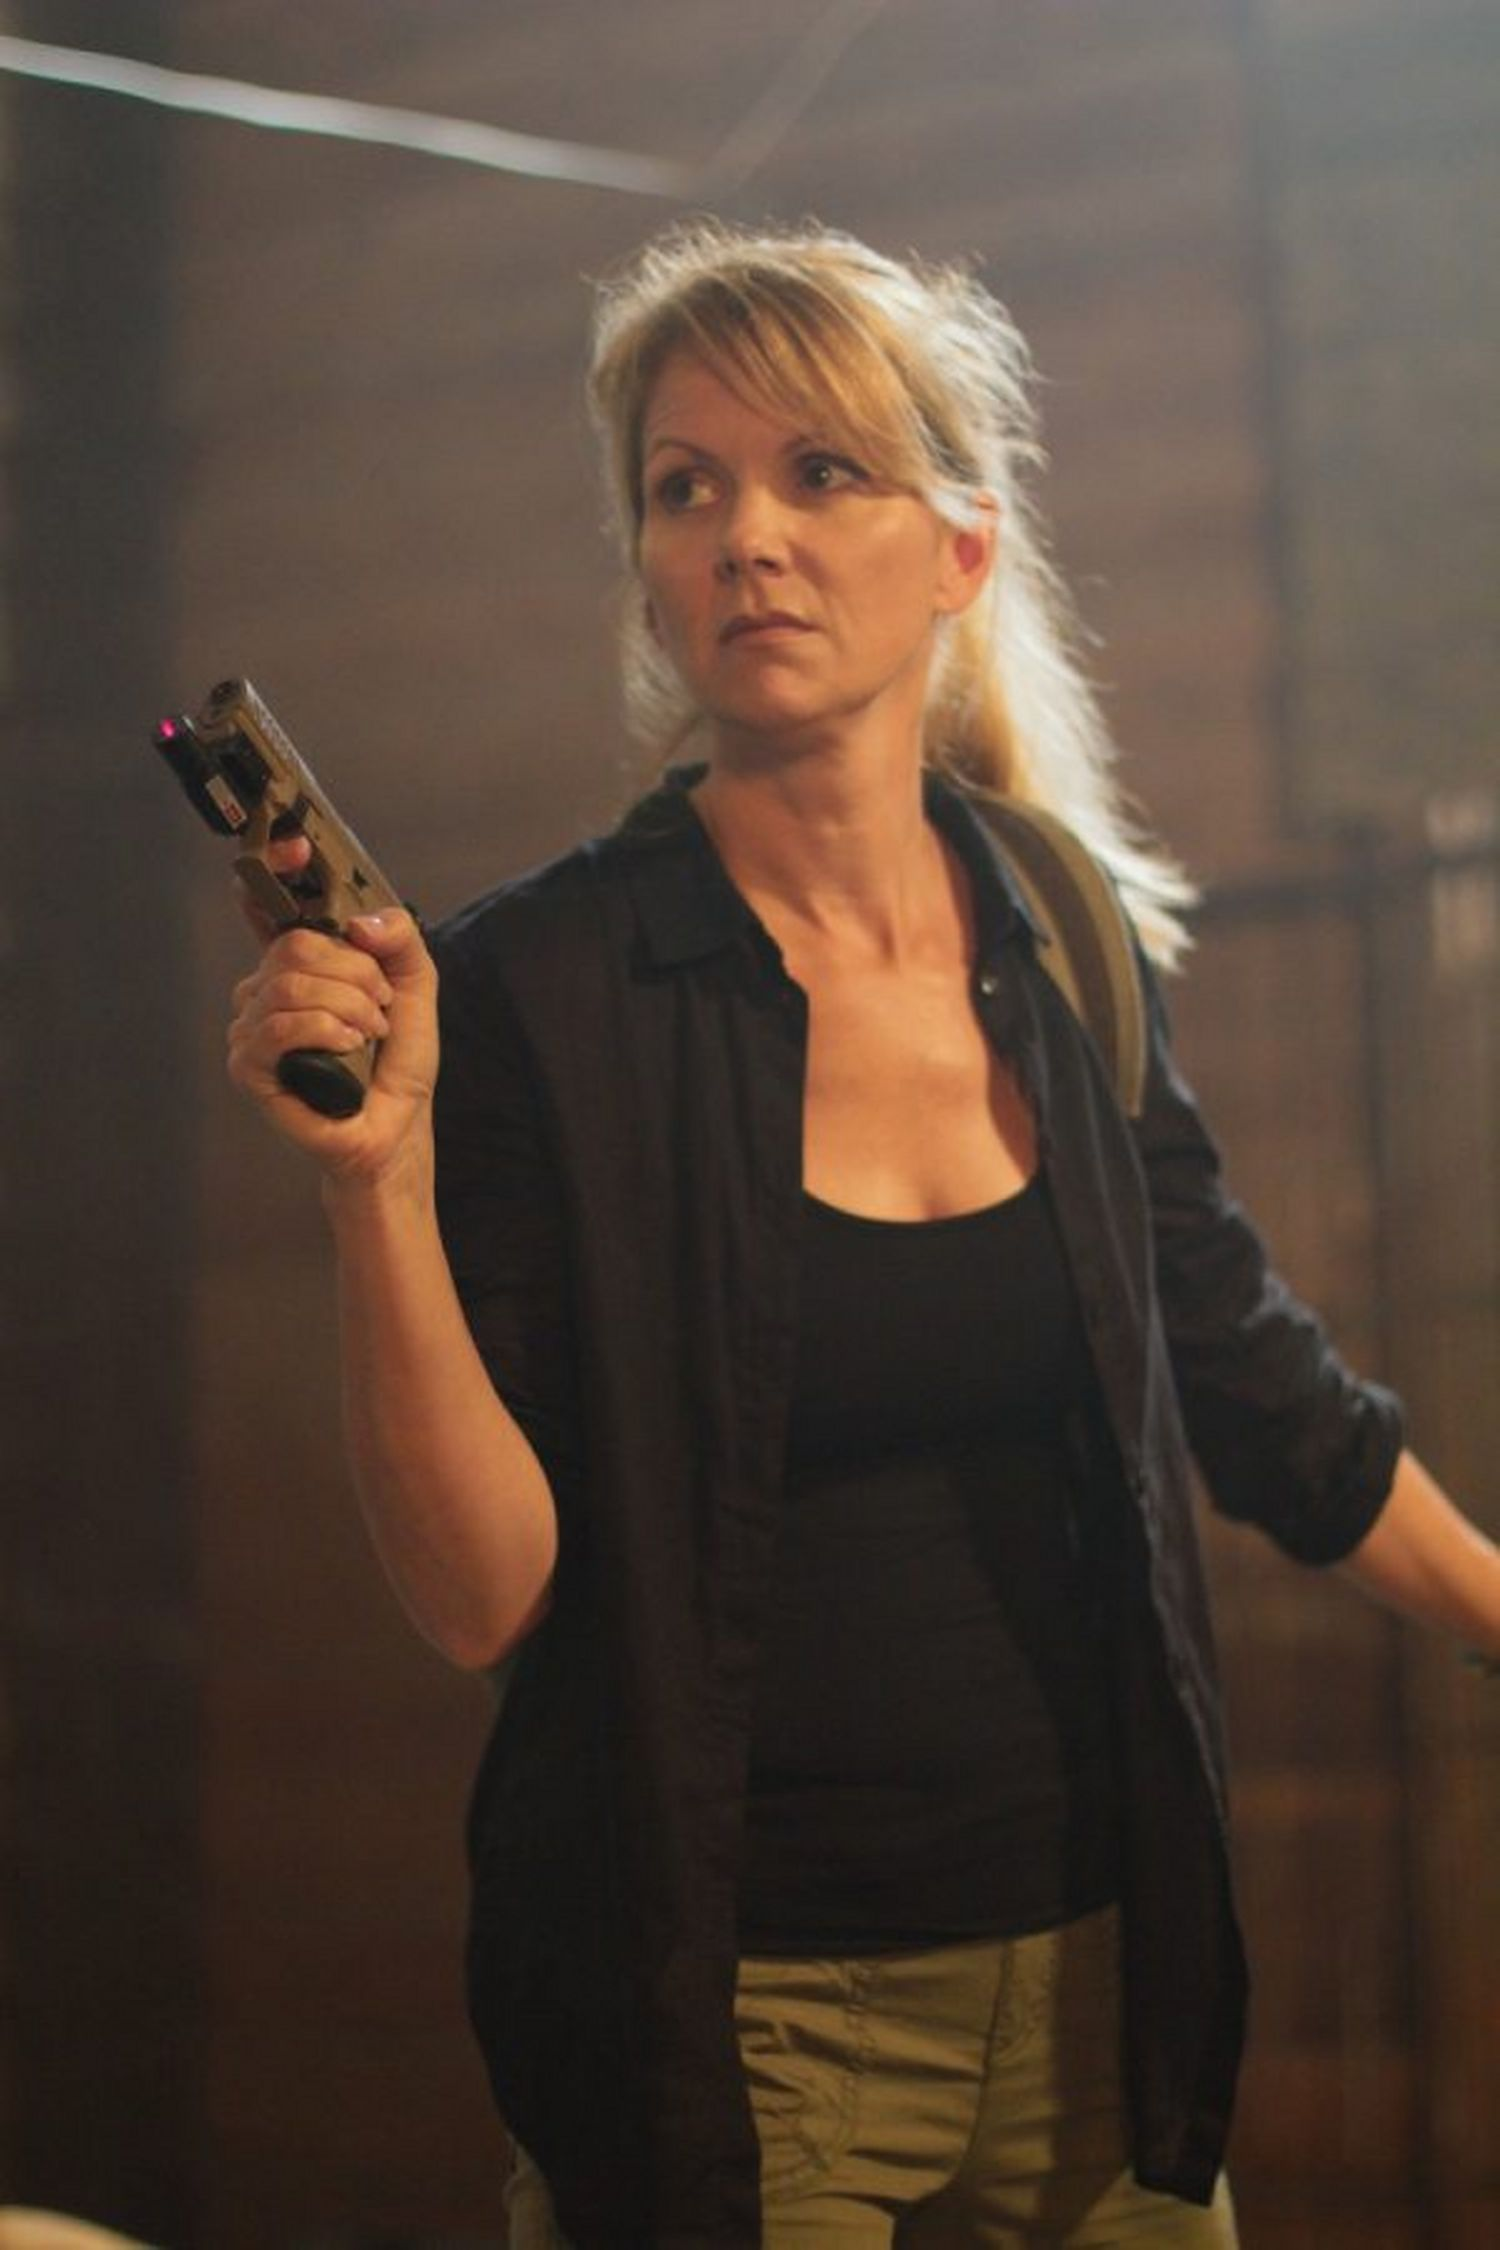 Julie Condra in The Driver (Lionsgate UK)